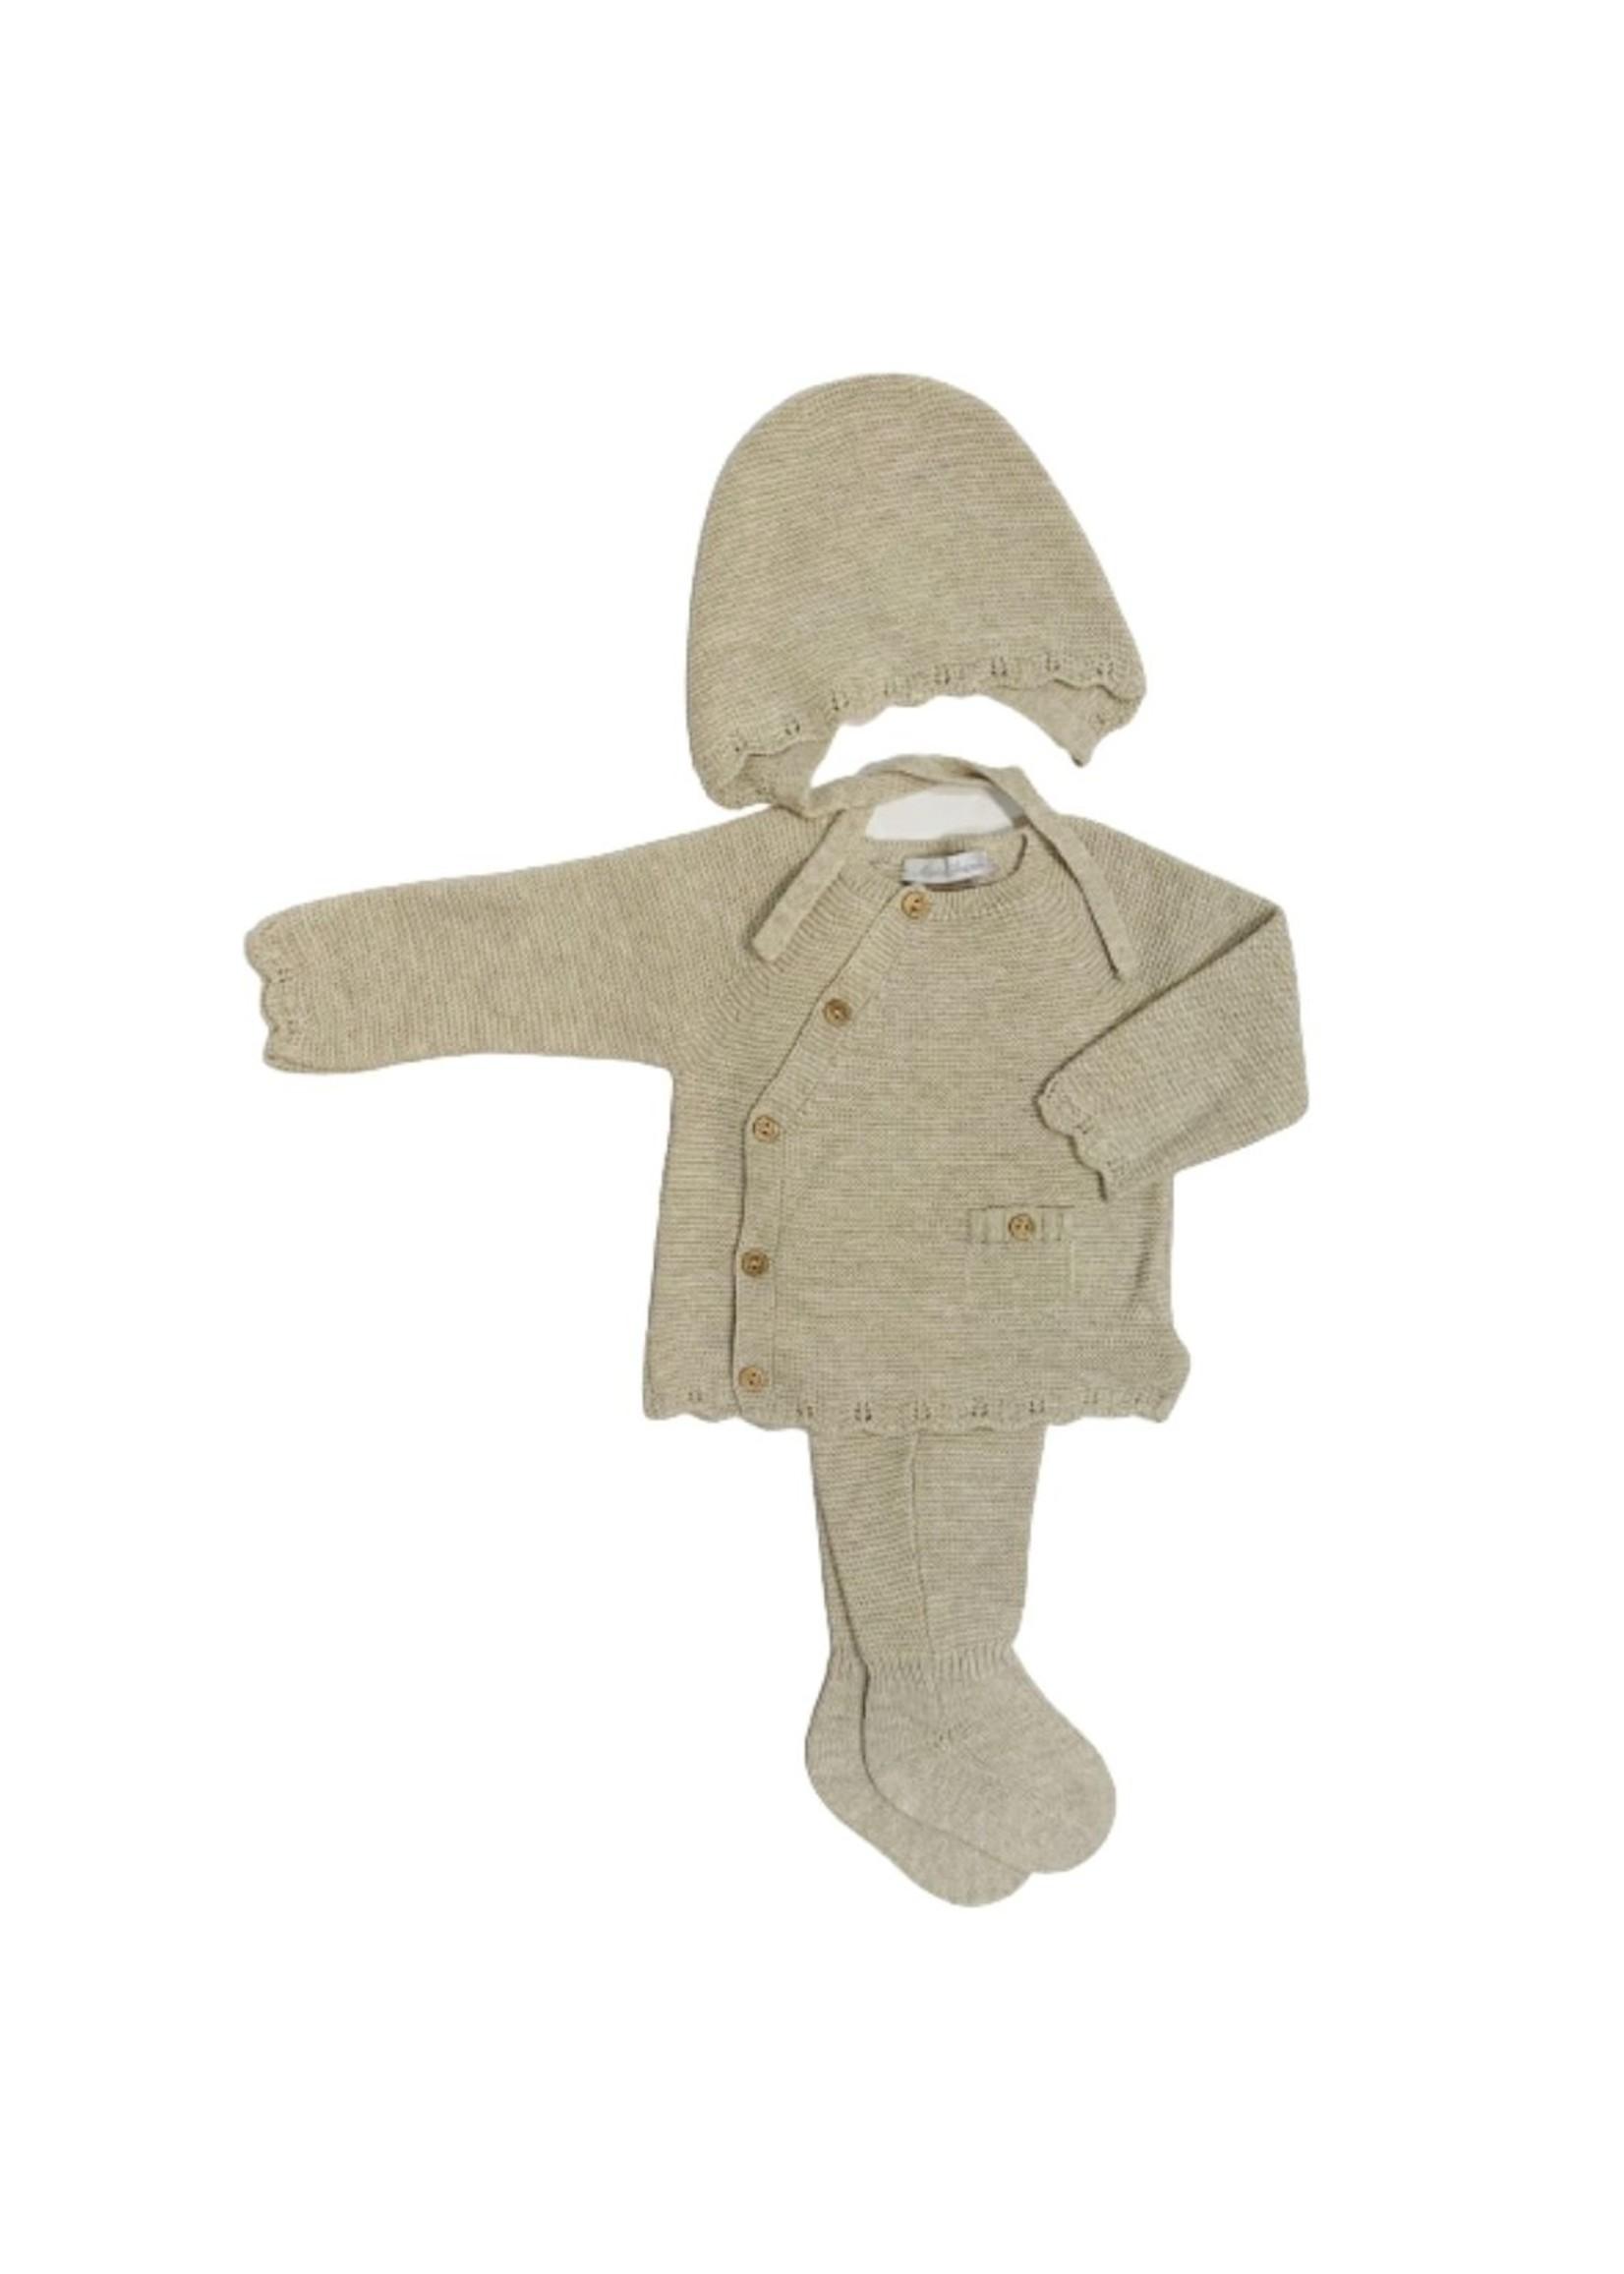 Golden Knit Sweater Legging and Bonnet Set